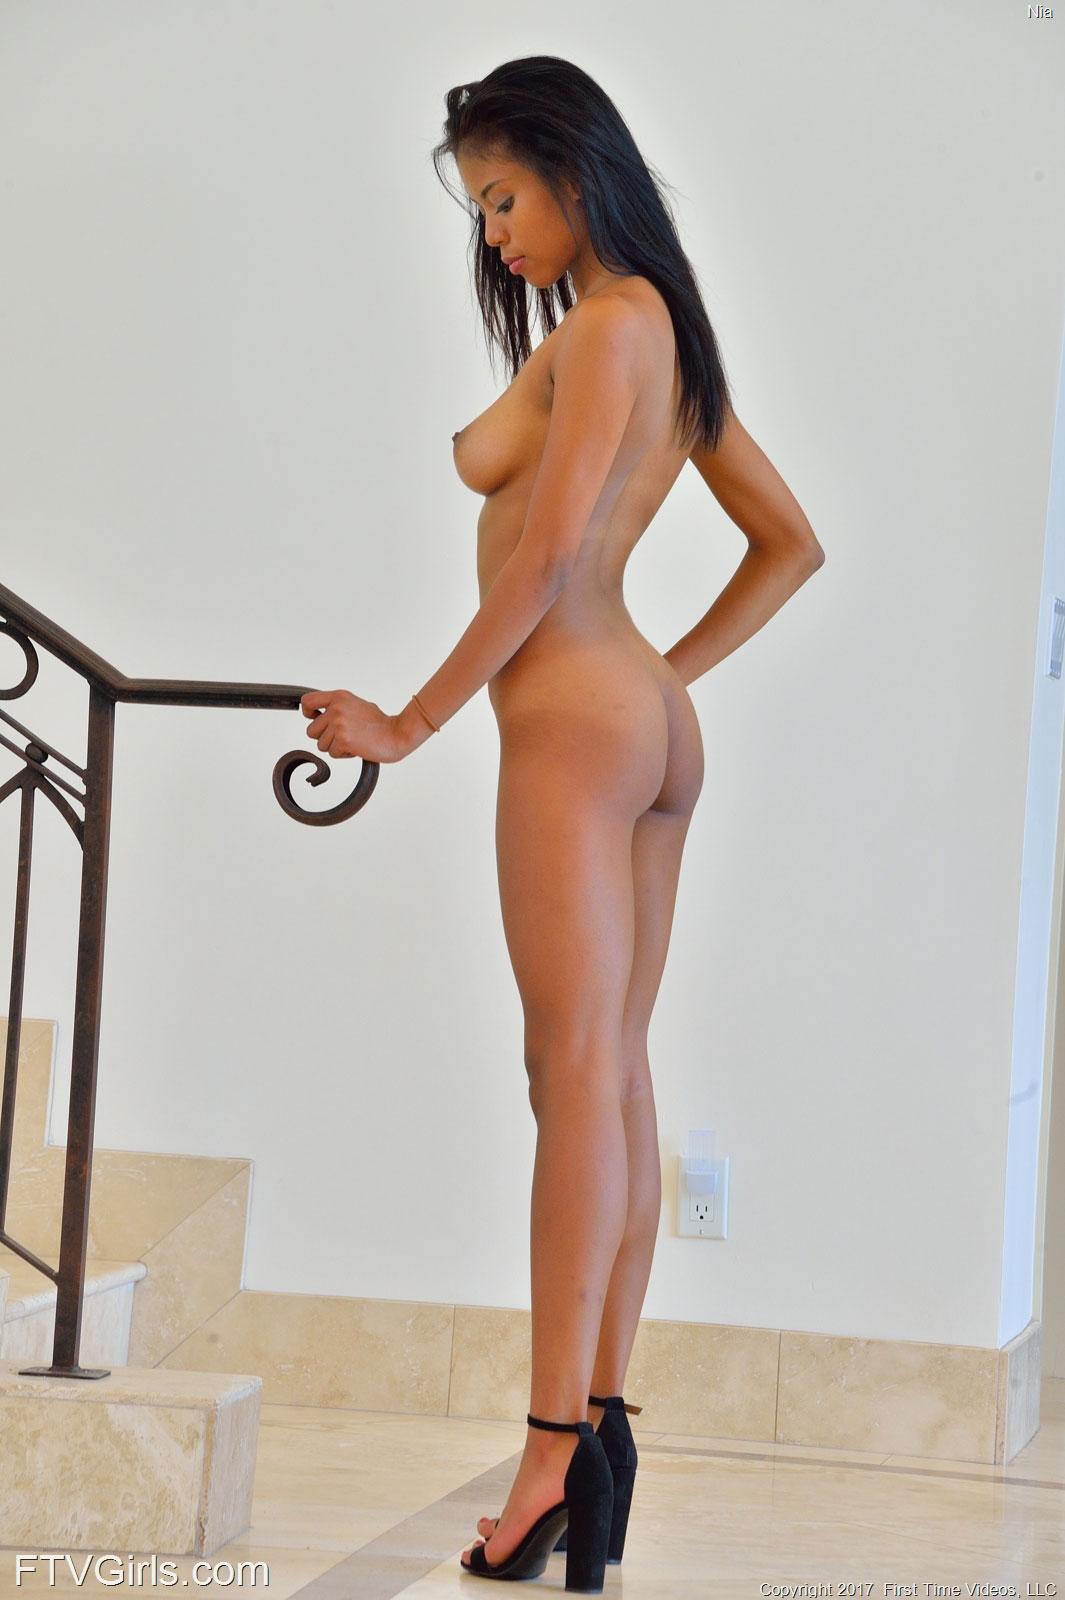 Nia FTV Girls | She is a cute half-black girl (very sexual)